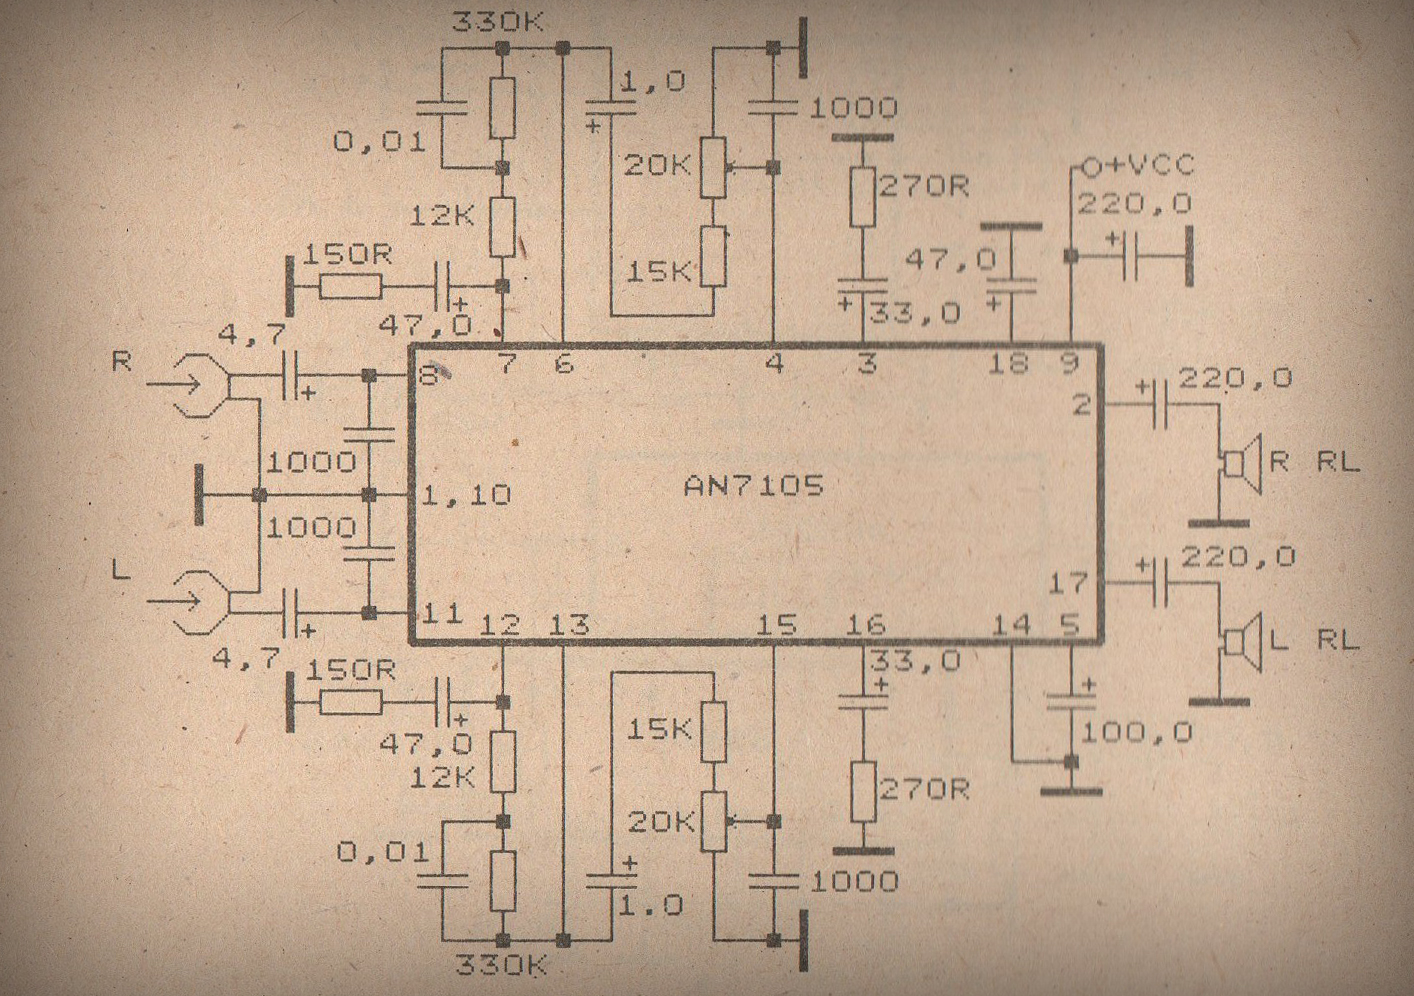 hight resolution of schematic audio amplifier with ic an7108 data schematic diagram schematic audio amplifier with ic ic an272